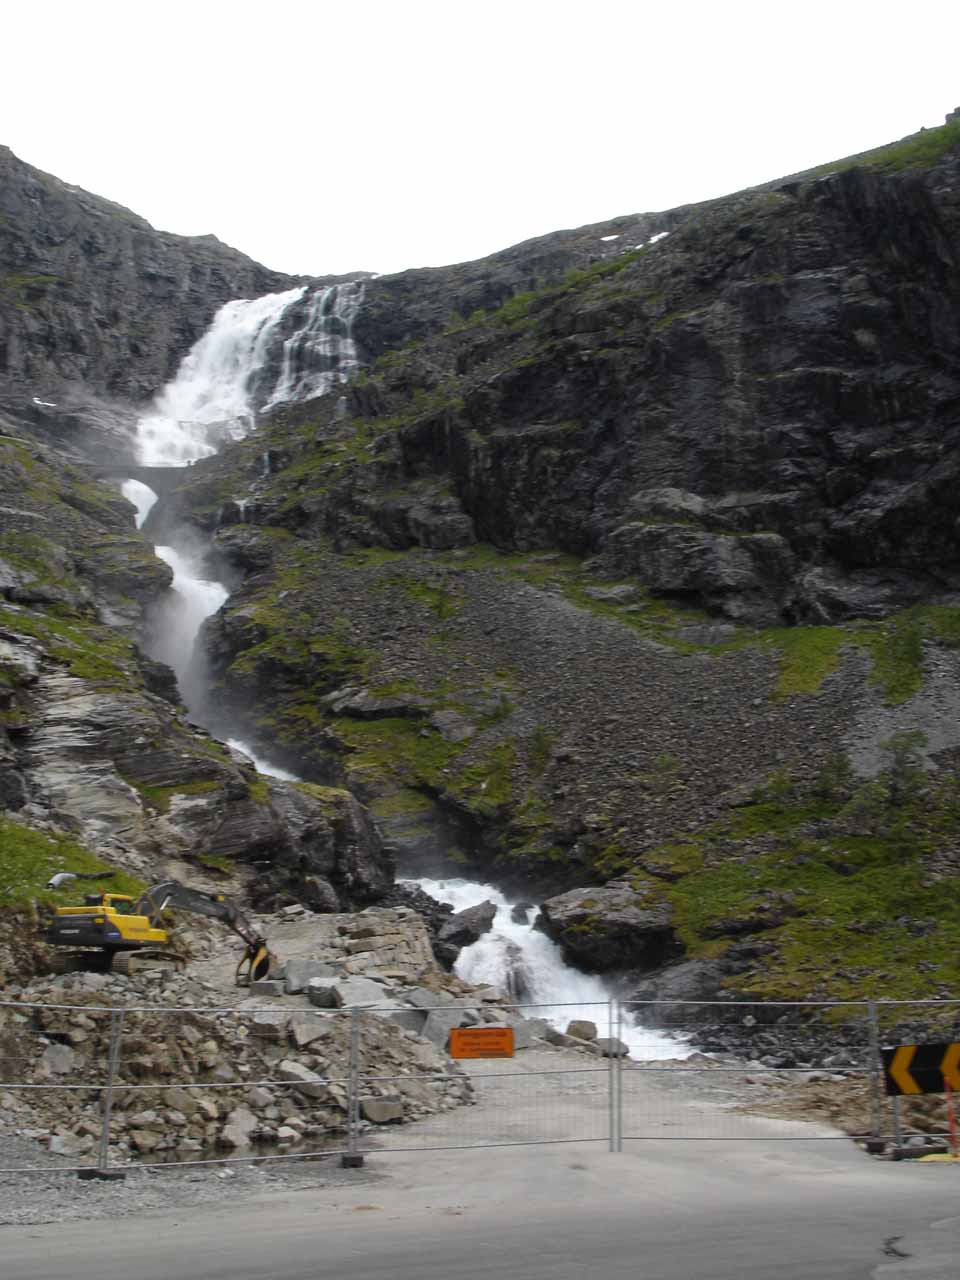 Construction zone before Stigfossen